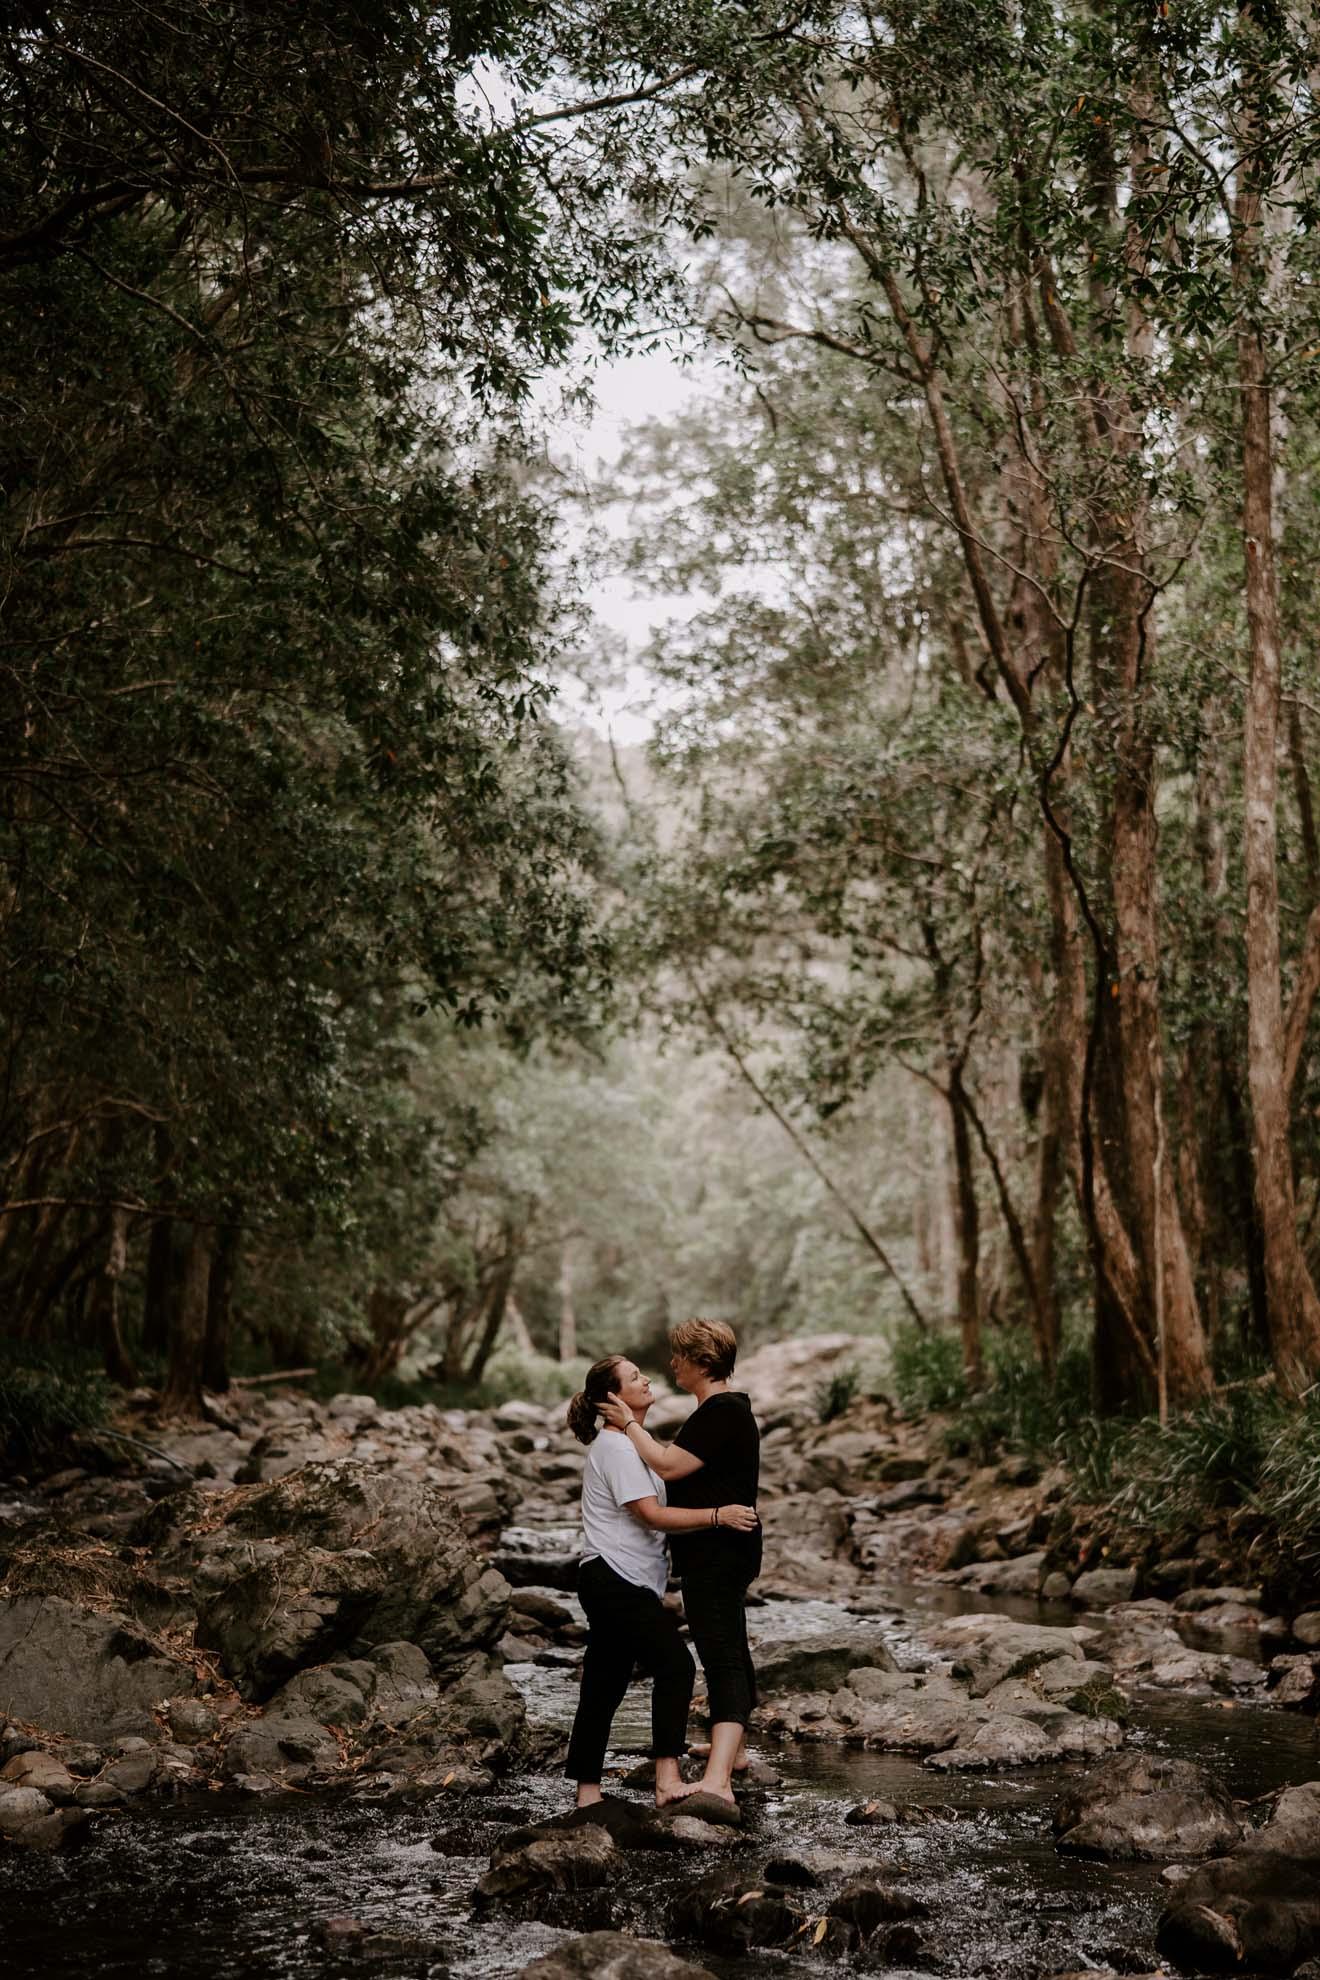 Fox & Kin photography New South Wales Australia rainforest waterfal older lesbian gay same-sex couple love photos Dancing With Her Australian magazine (1)